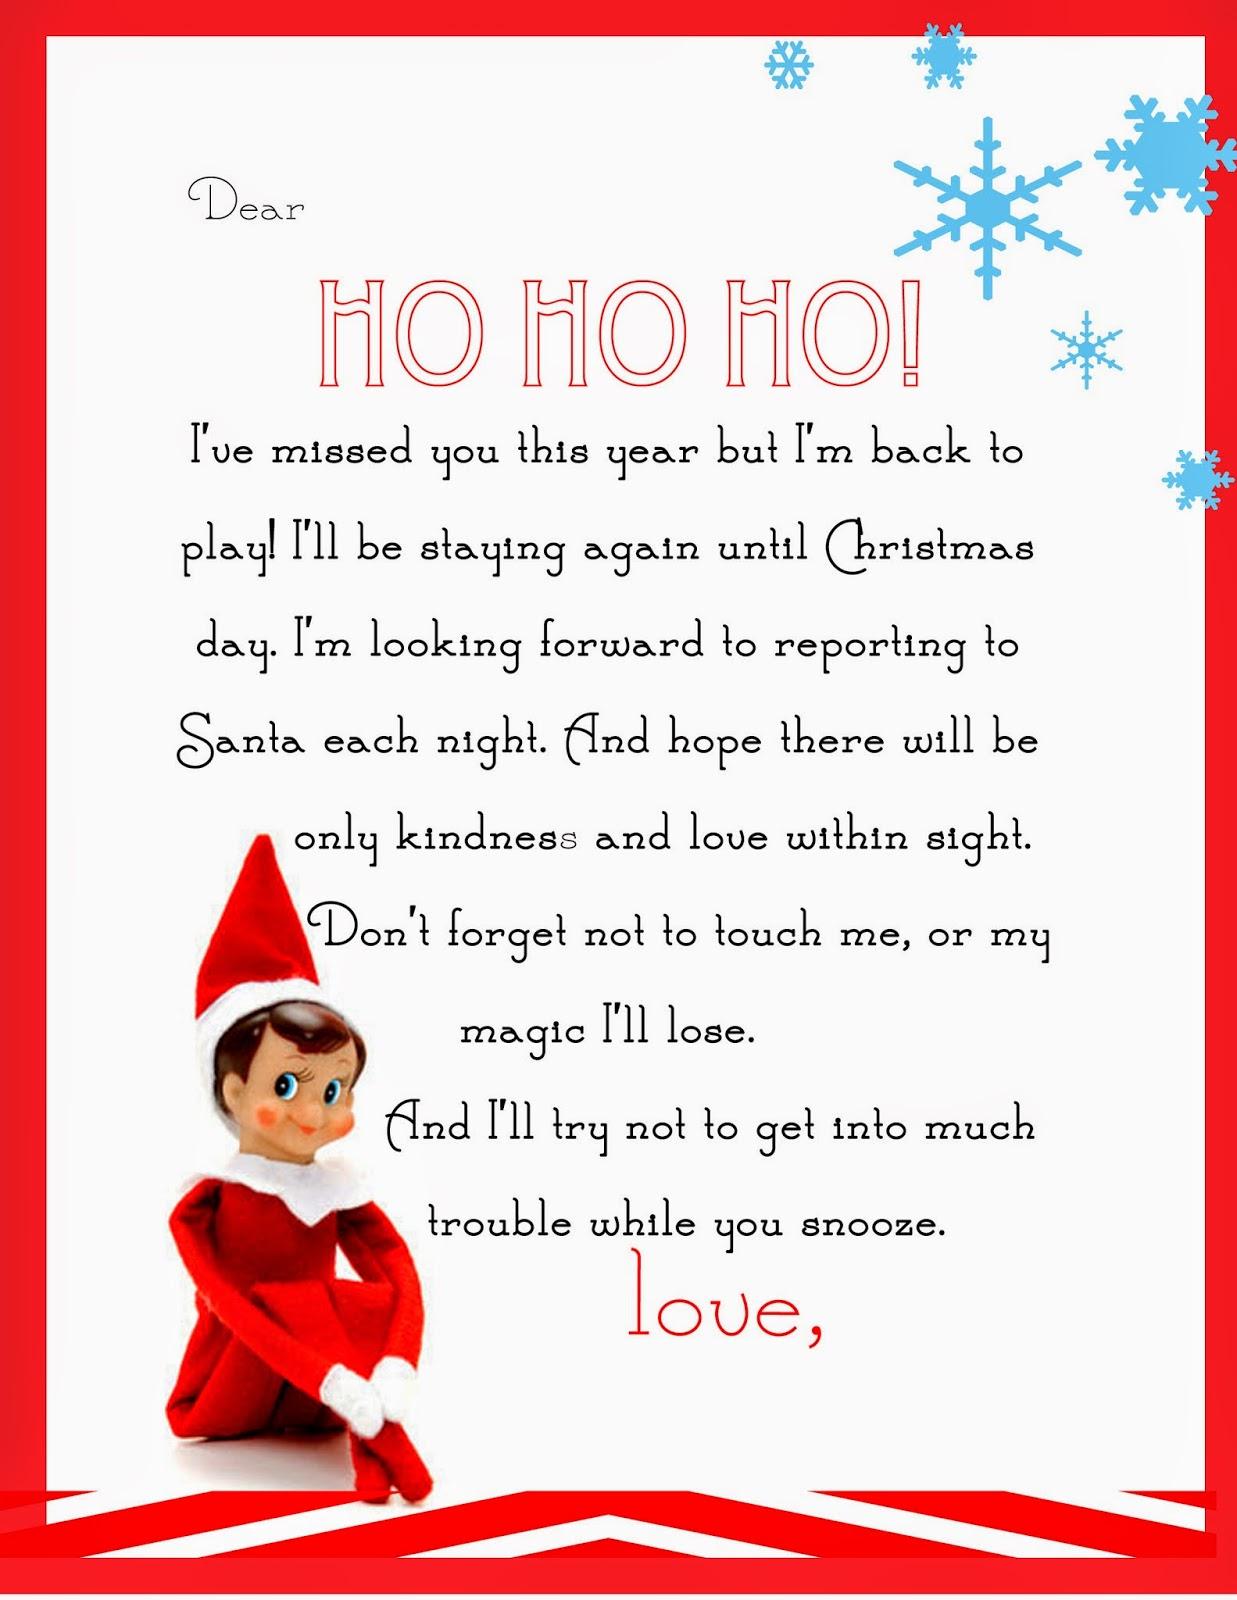 Elf On The Shelf Letter {Free Printable} - Free Printable Elf On The Shelf Letter